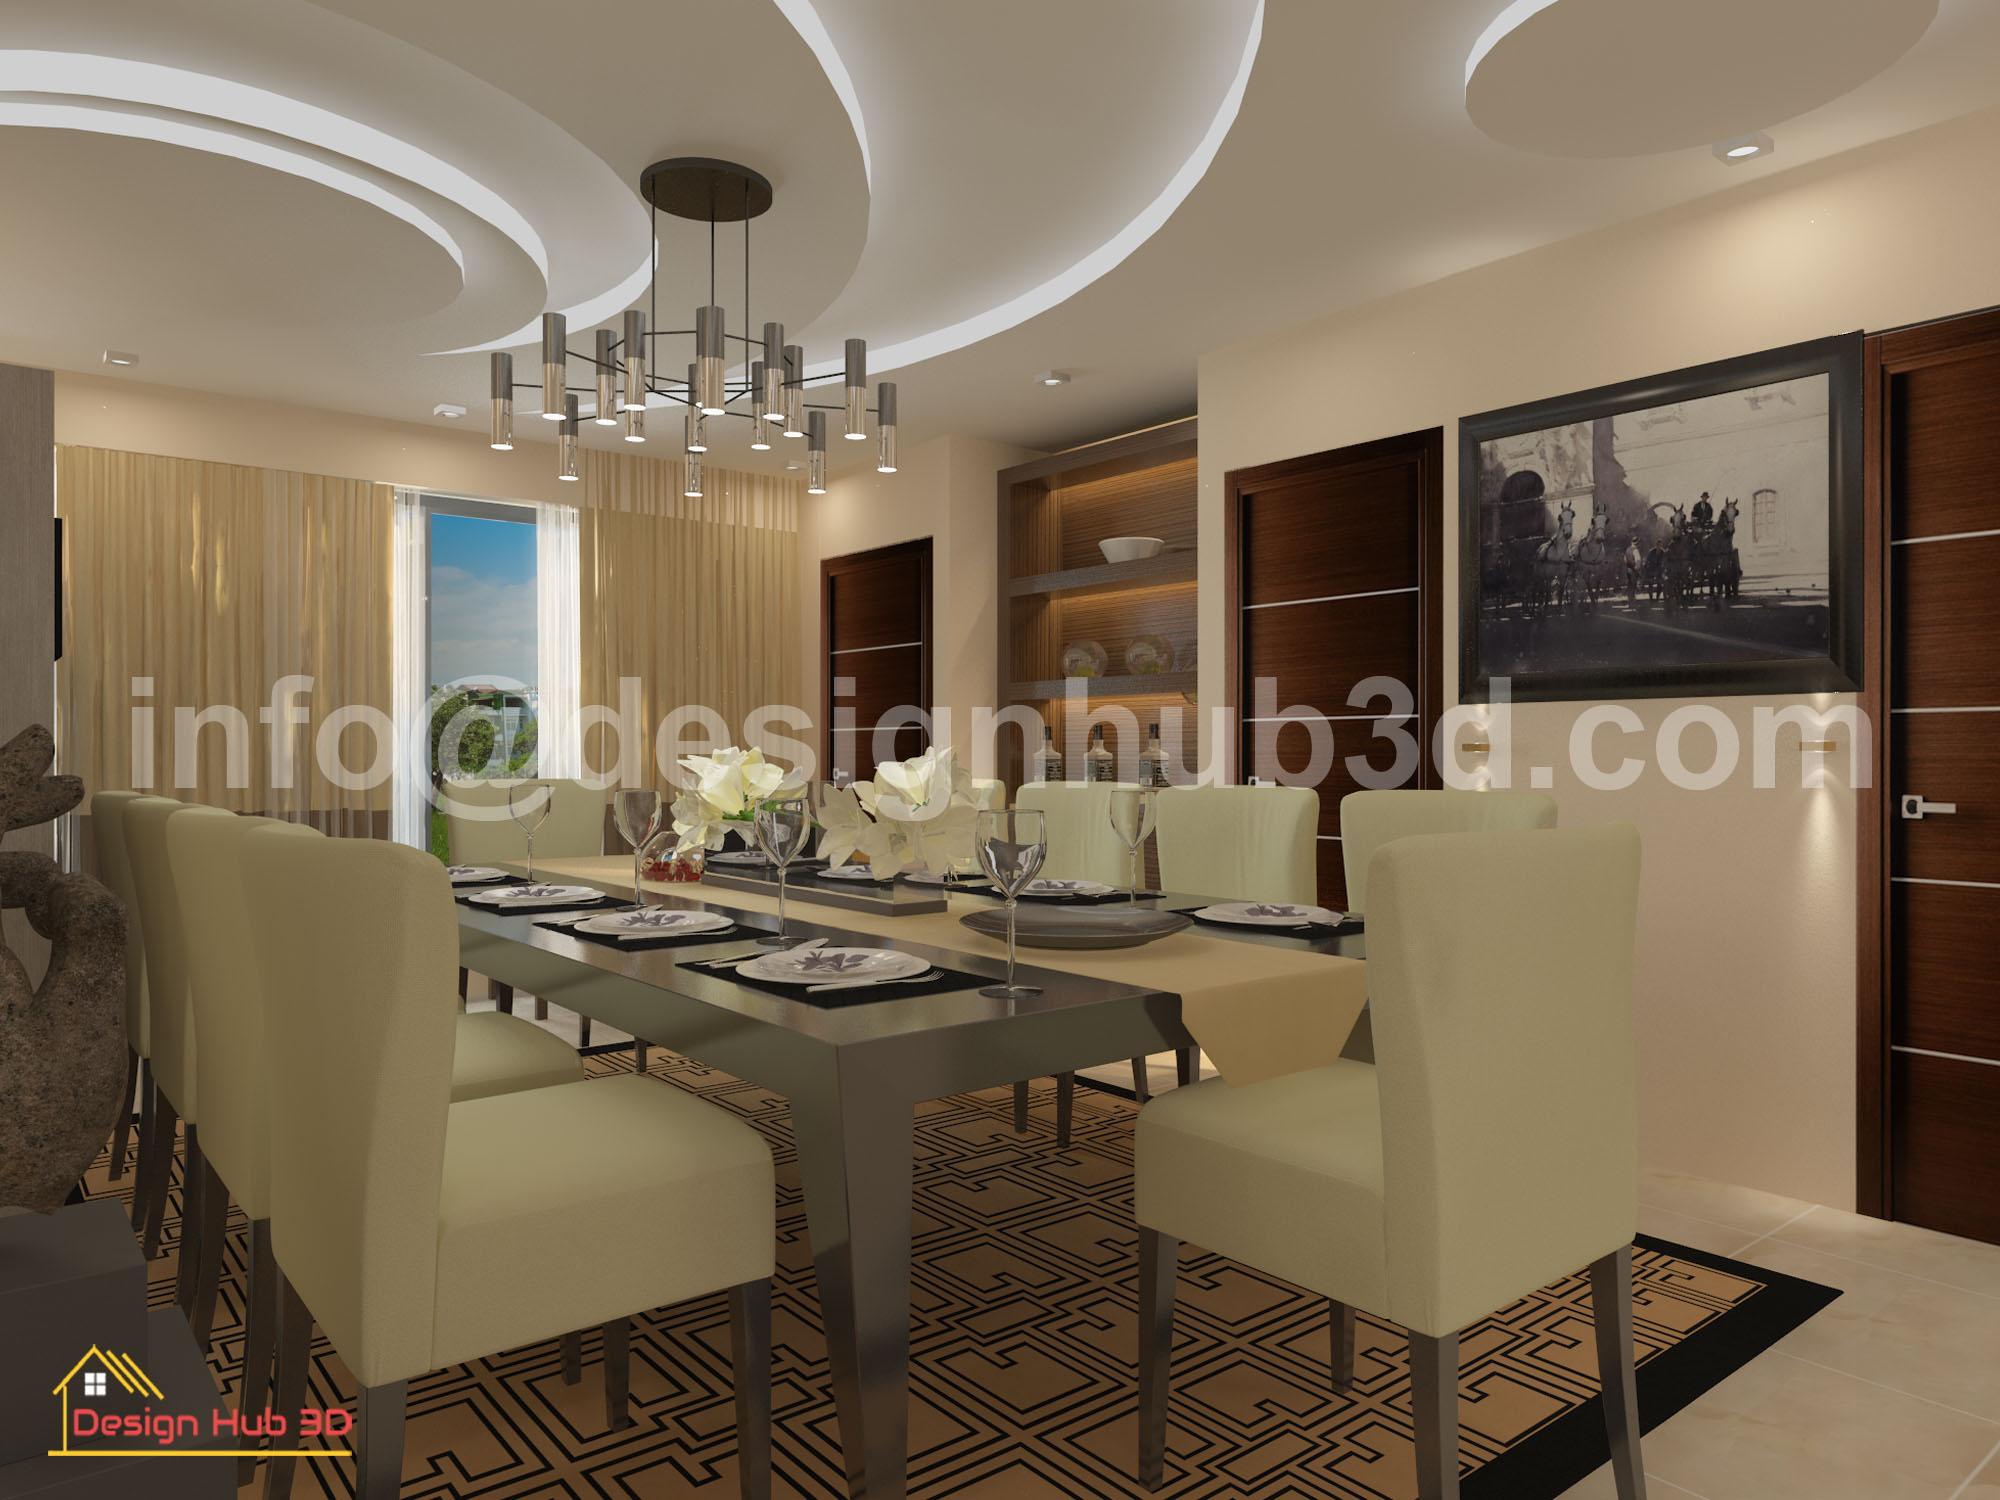 Design Hub 3D - Dining interior design